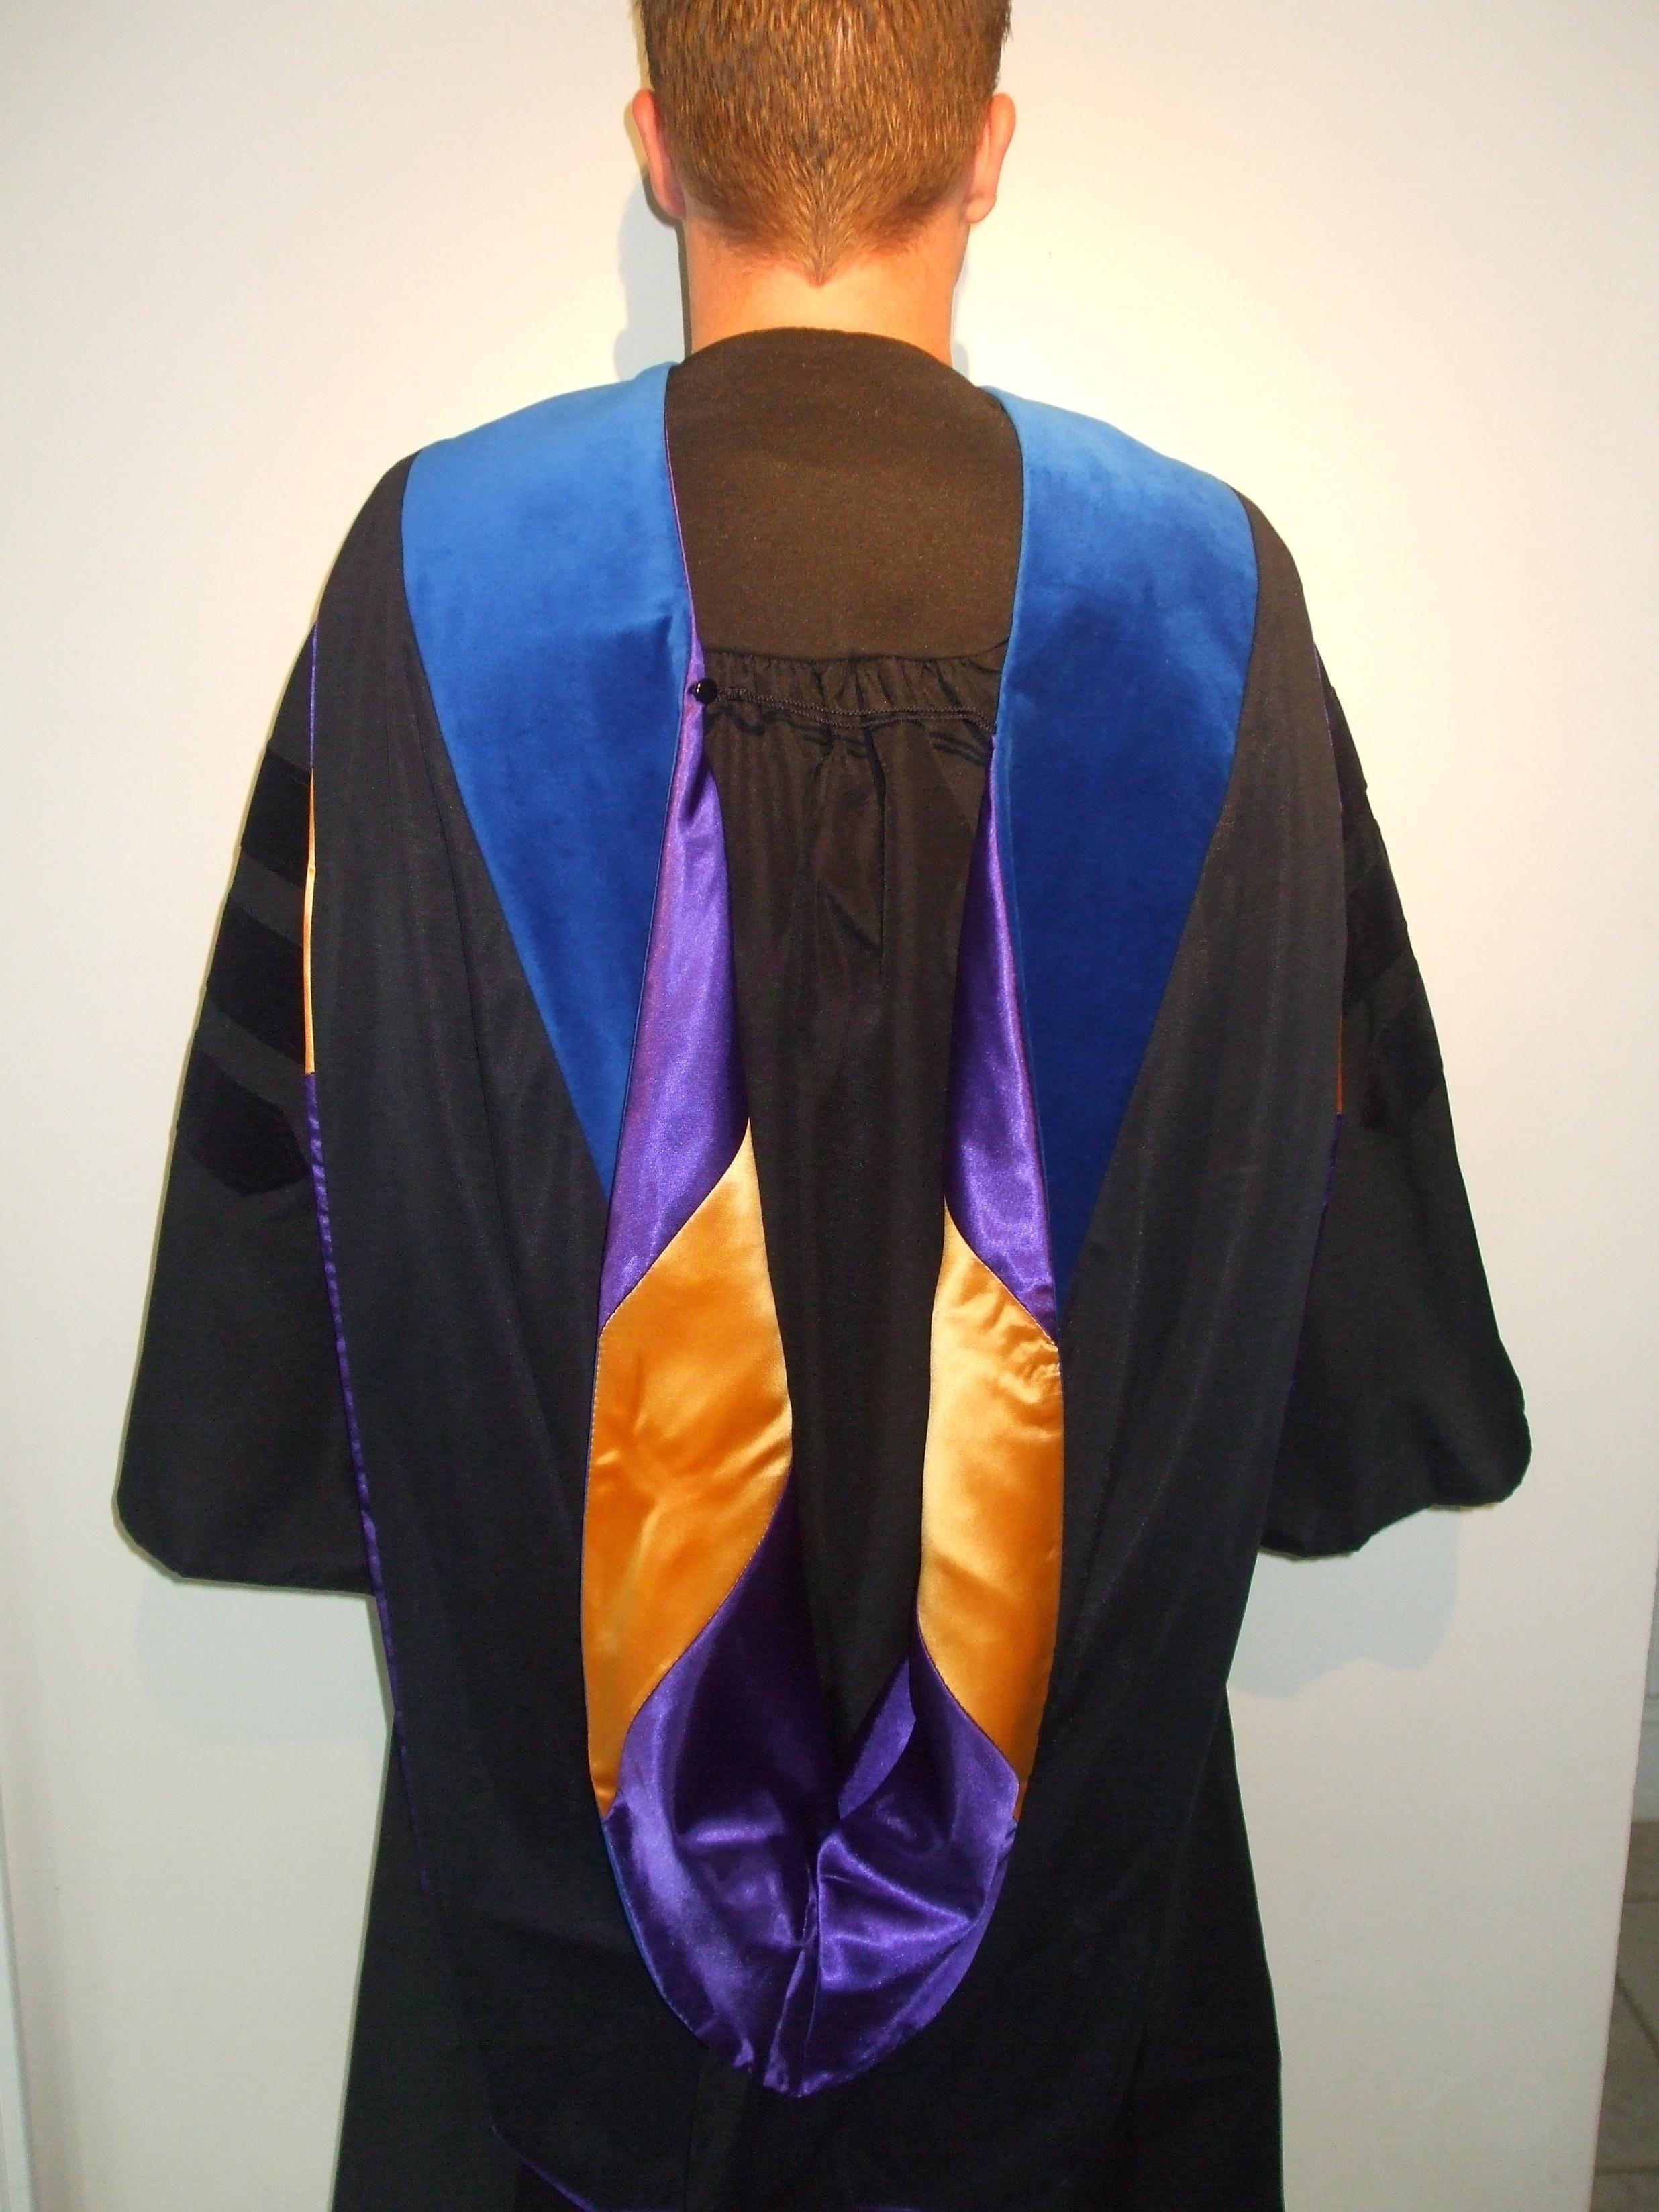 Souvenir Regalia : Graduation Supplies | Caps and Gowns, Tassels ...